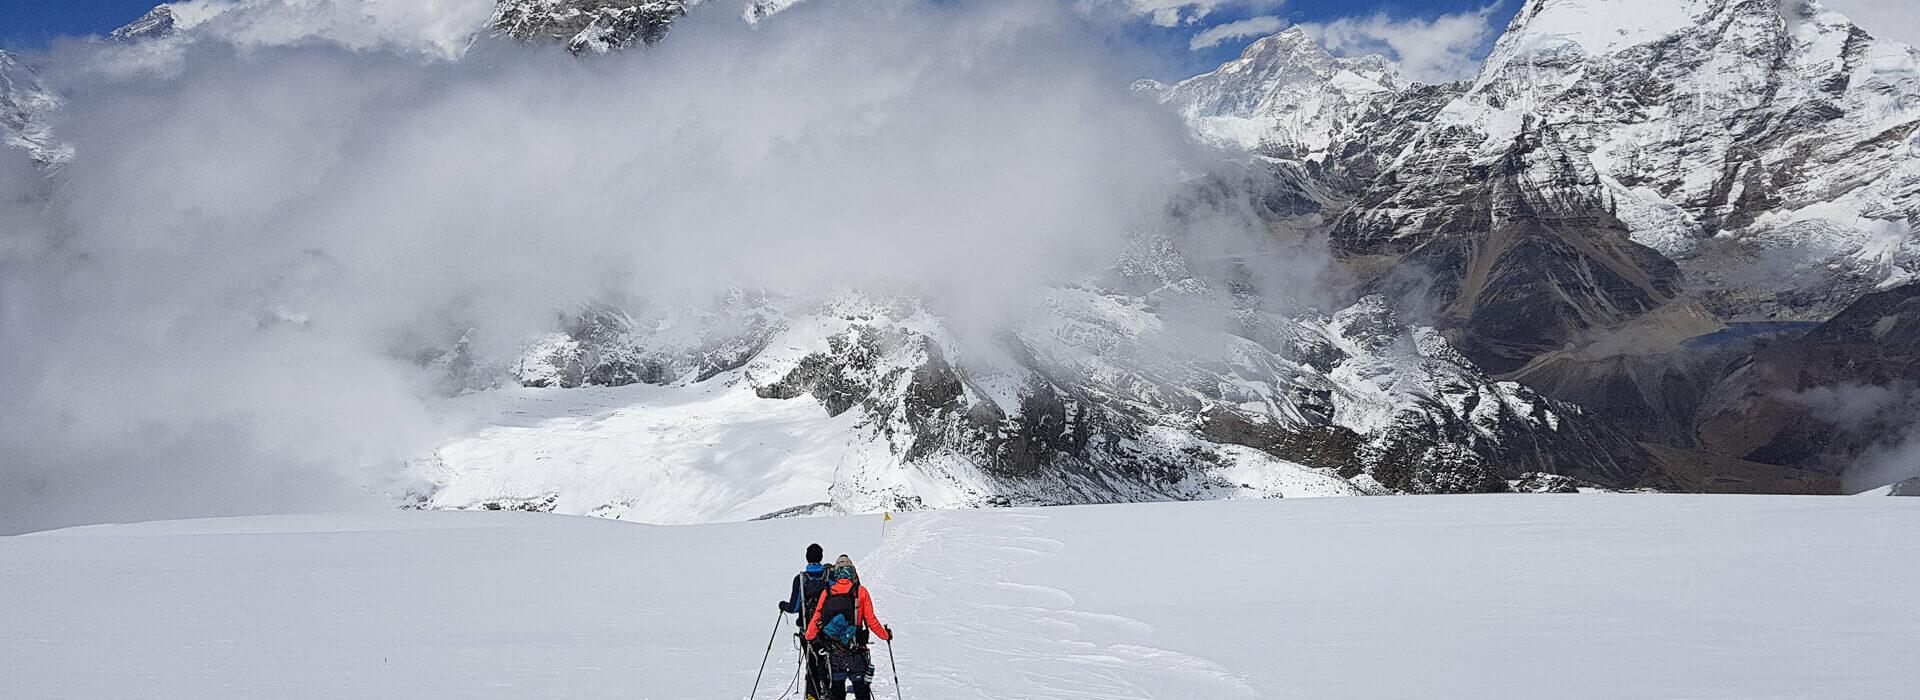 Mera Peak with Earth's Edge 5